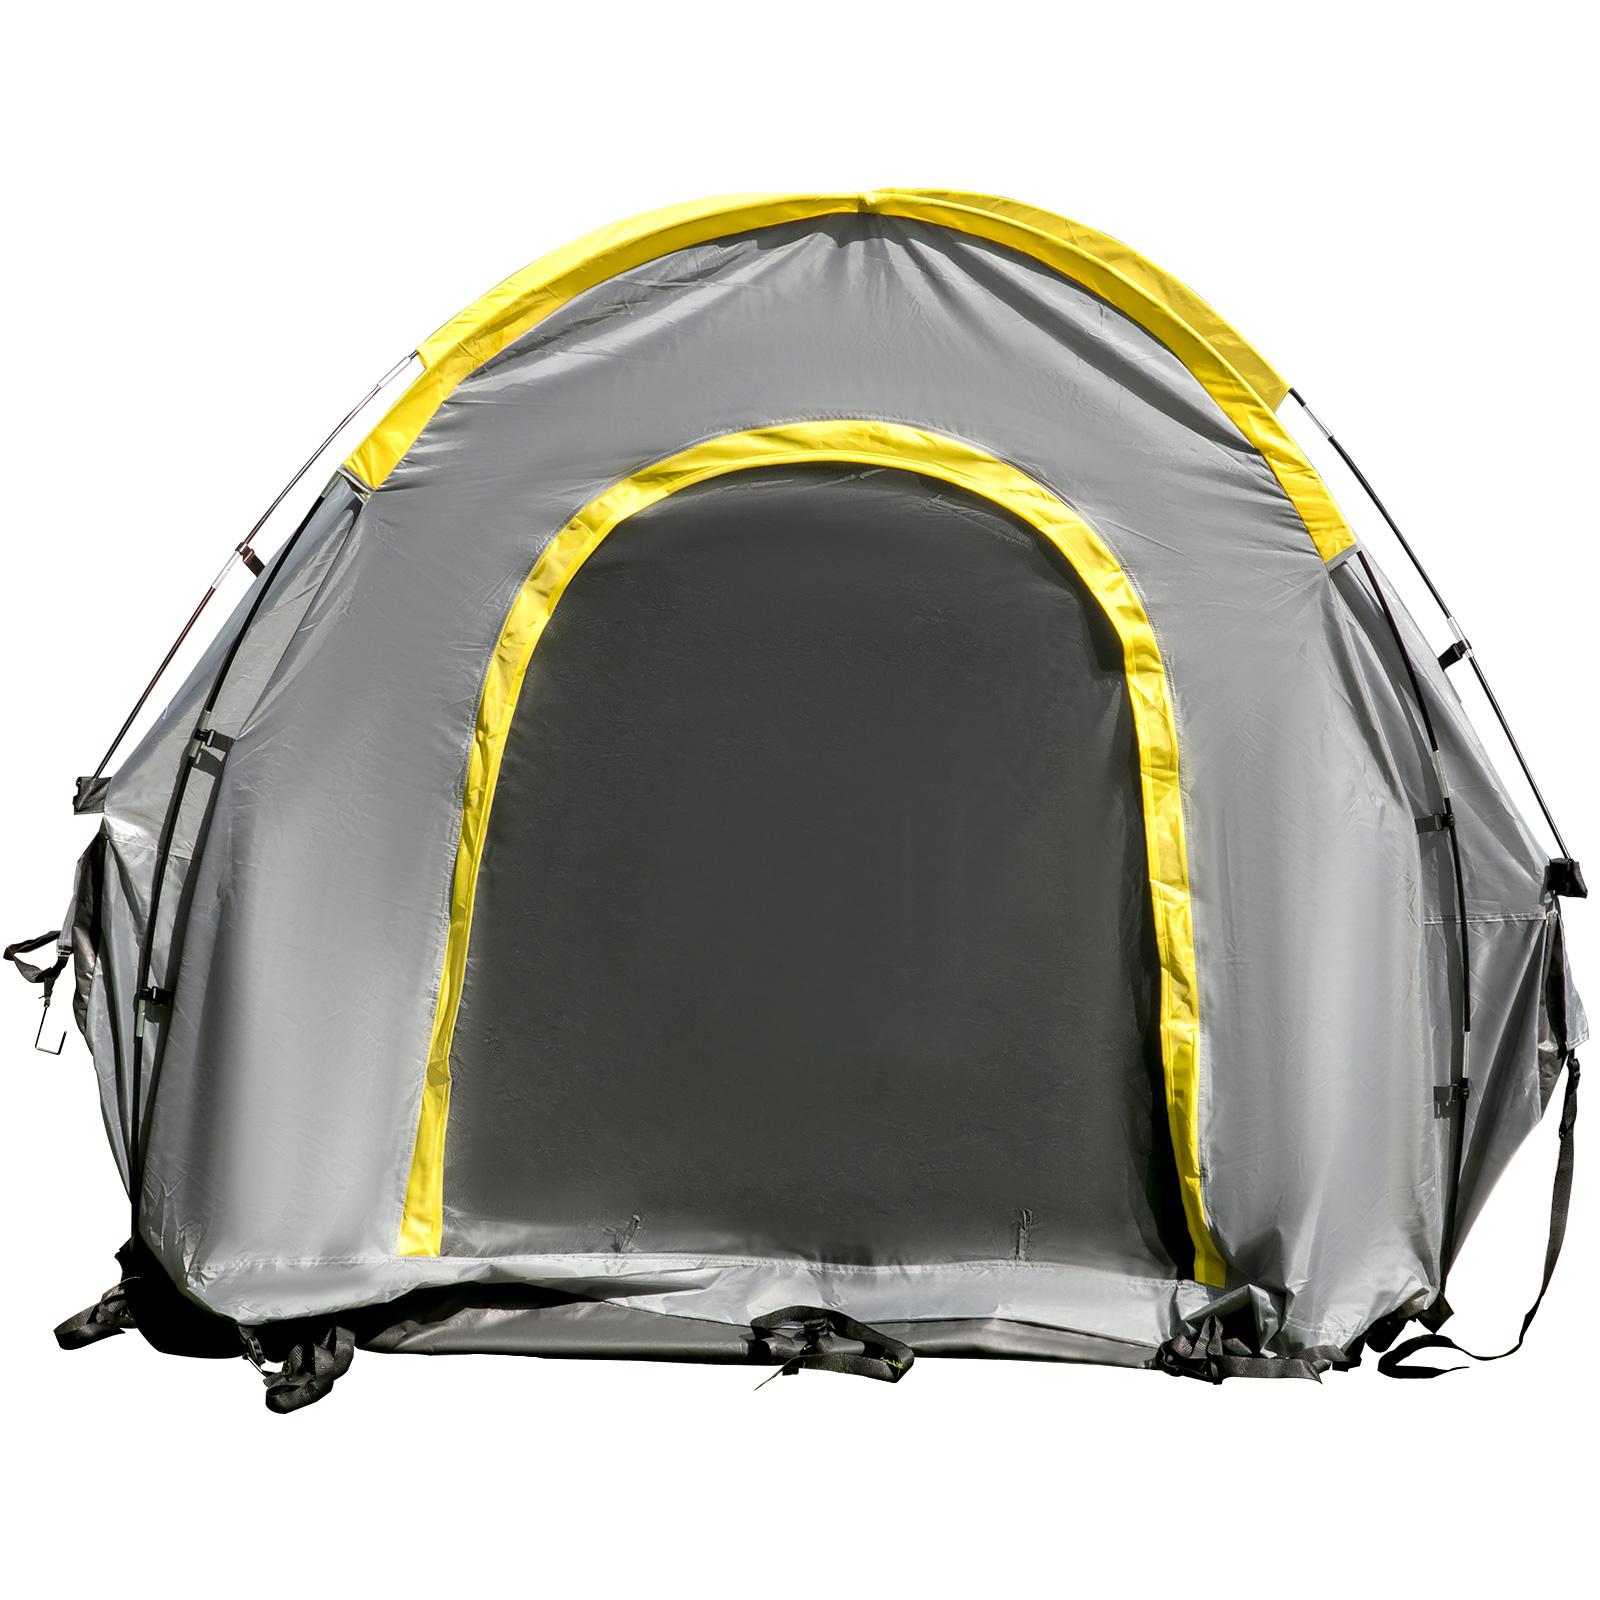 thumbnail 13 - VEVOR Truck Tent Truck Bed Tent 5' - 8' Pickup Tent Waterproof Outdoor Camping